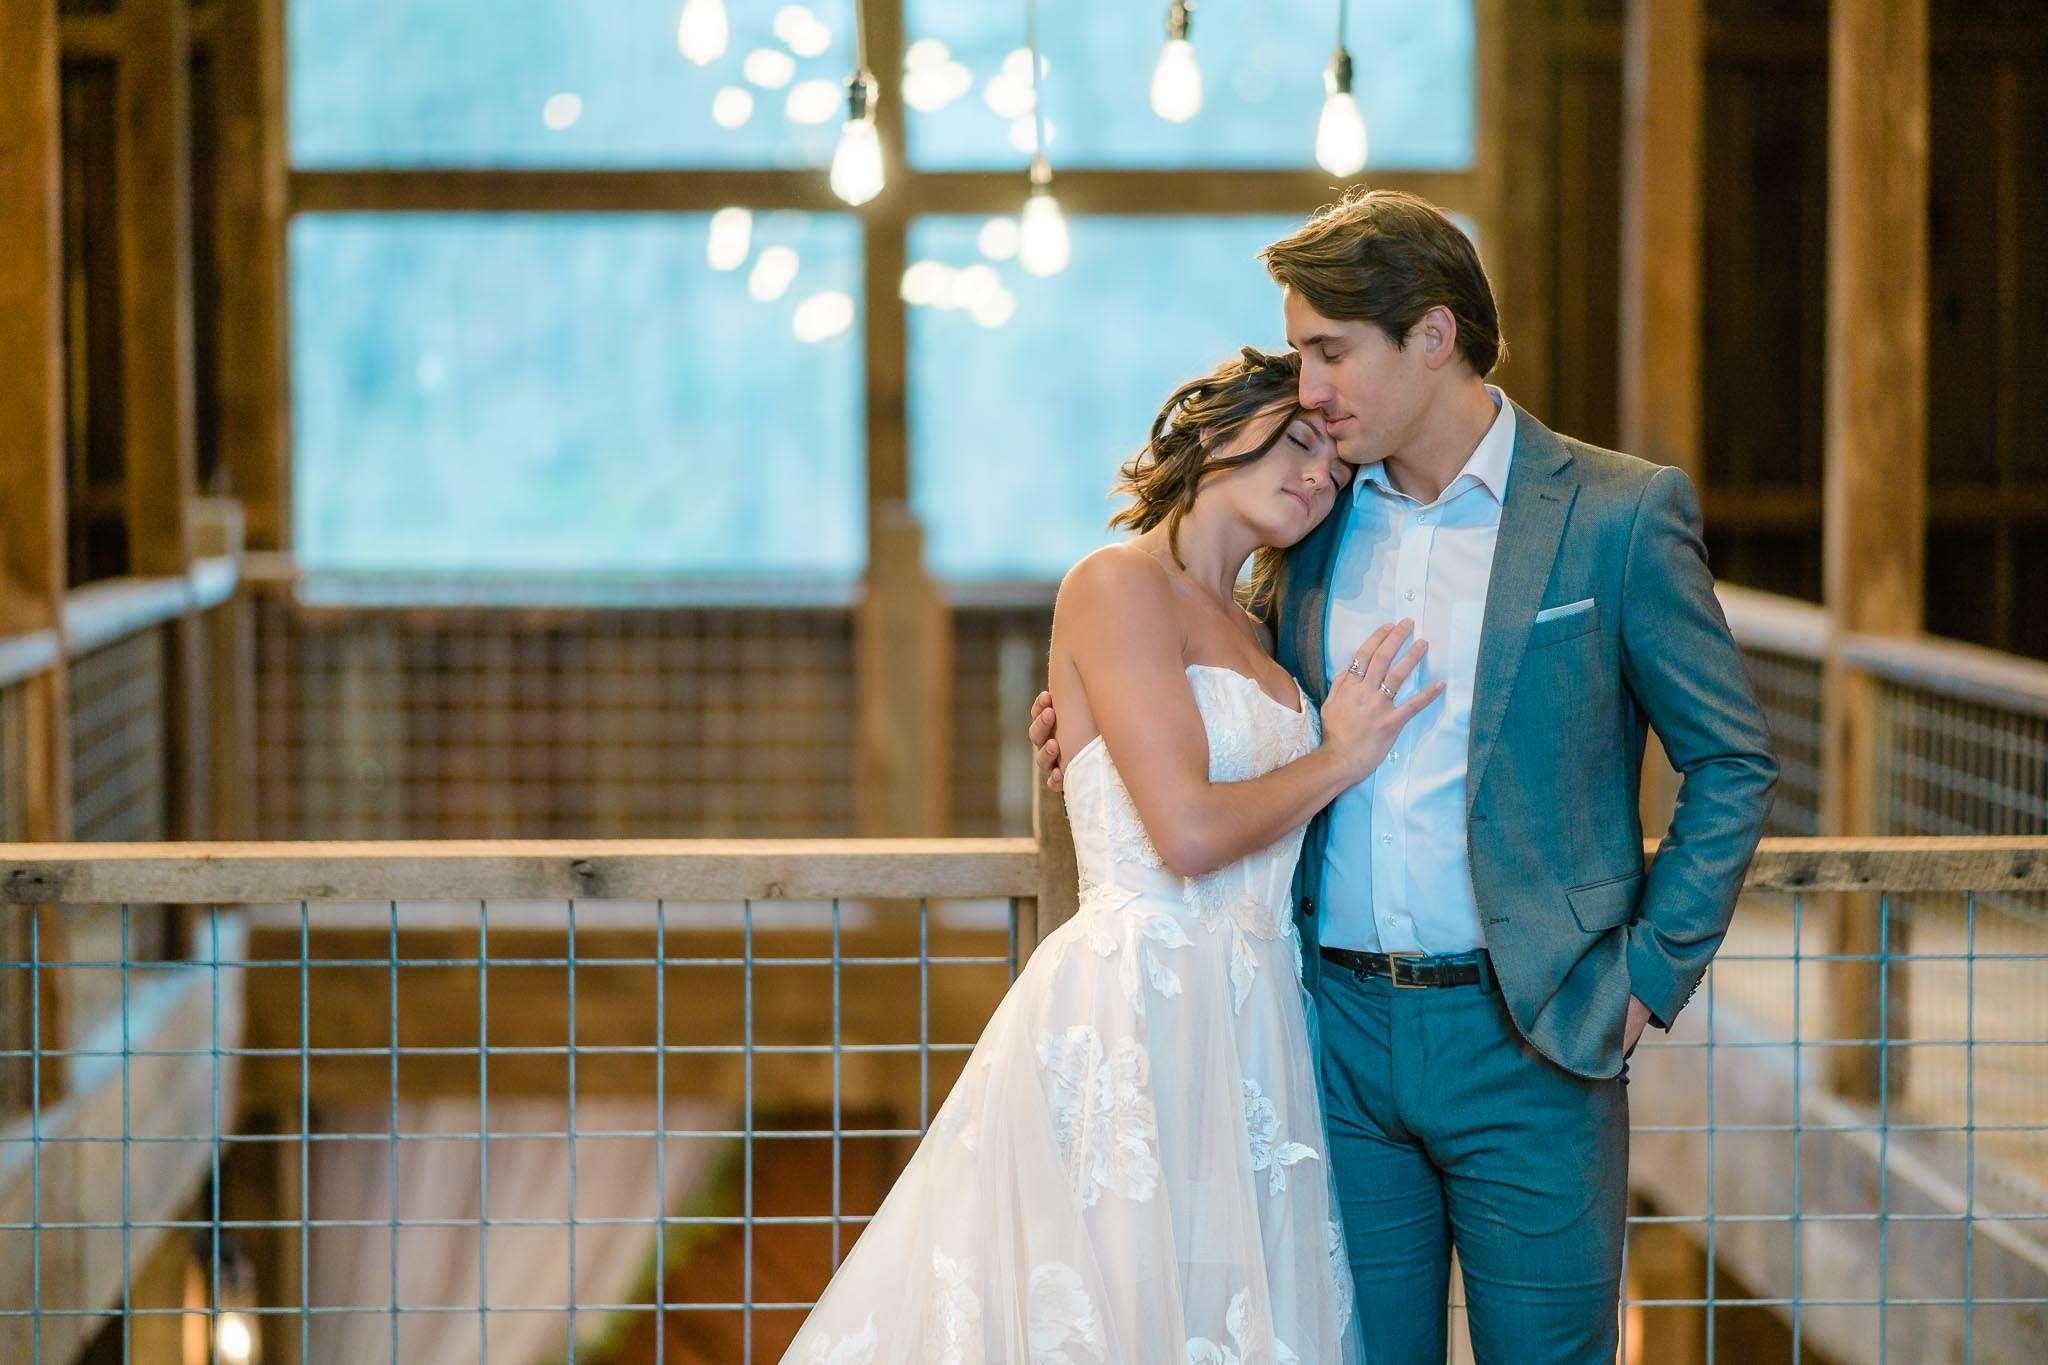 Elizabethtown, KY Wedding Photographer - Keepsake Wedding Photography